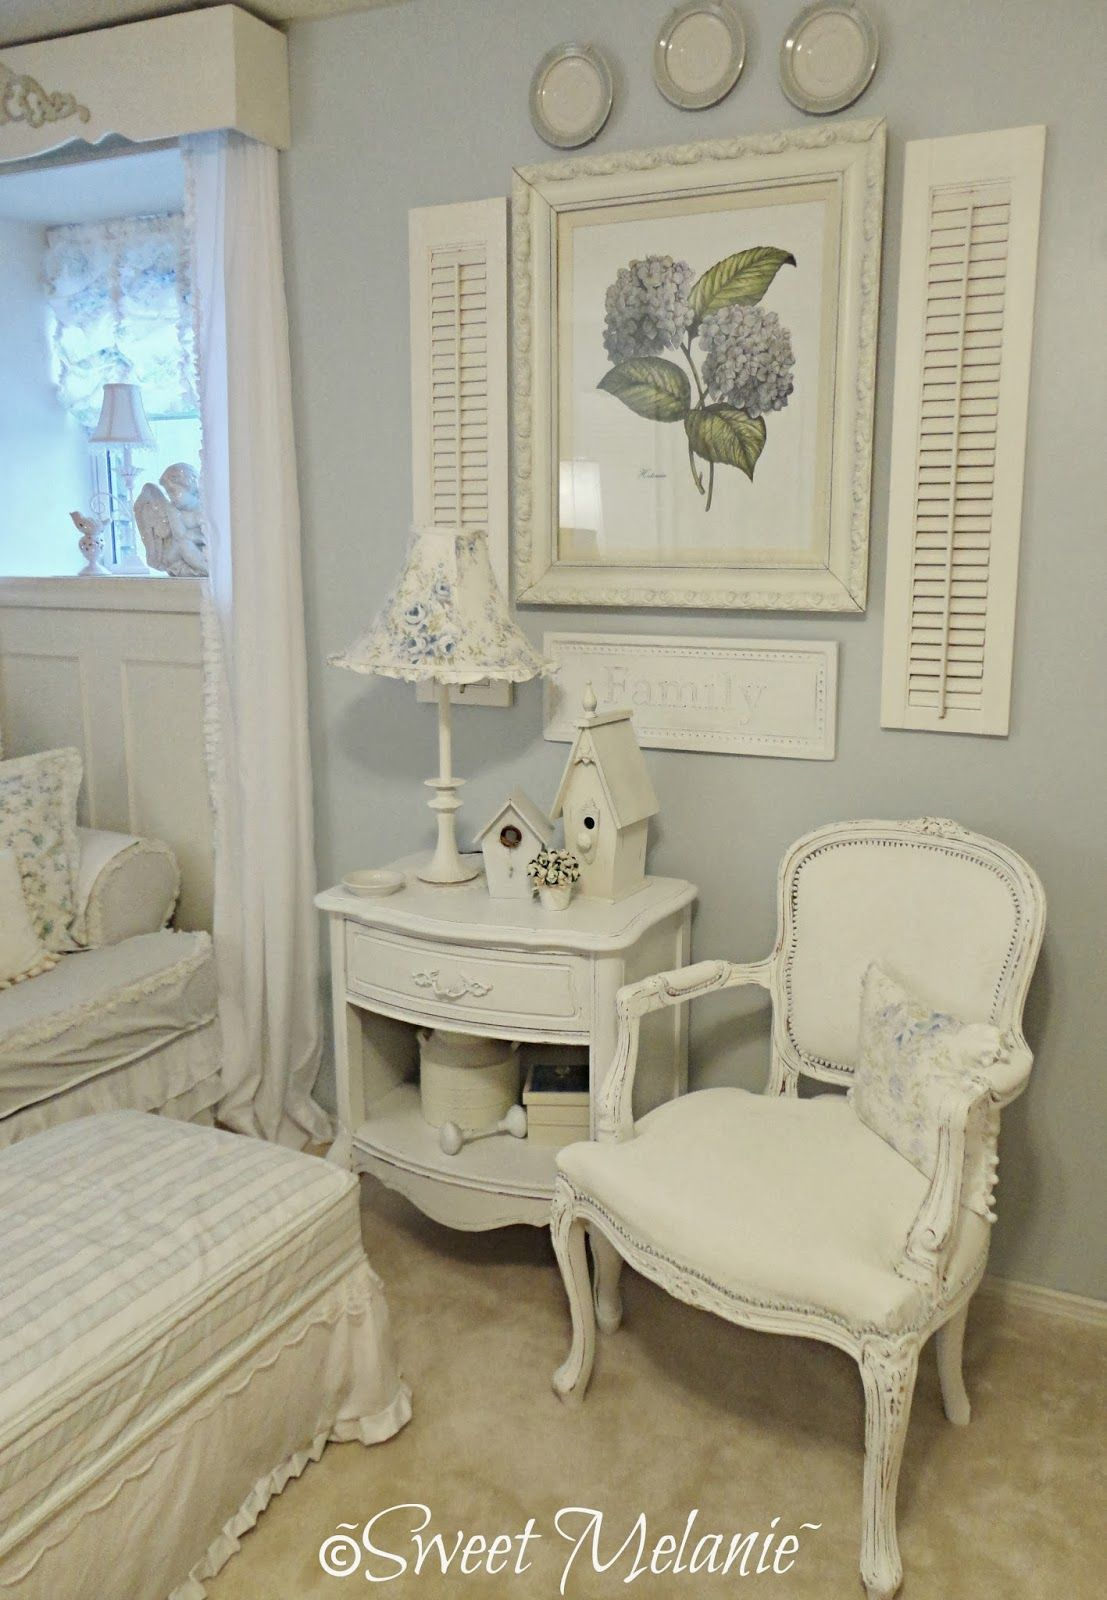 Sweet Melanie Shabby chic furniture, Shabby chic